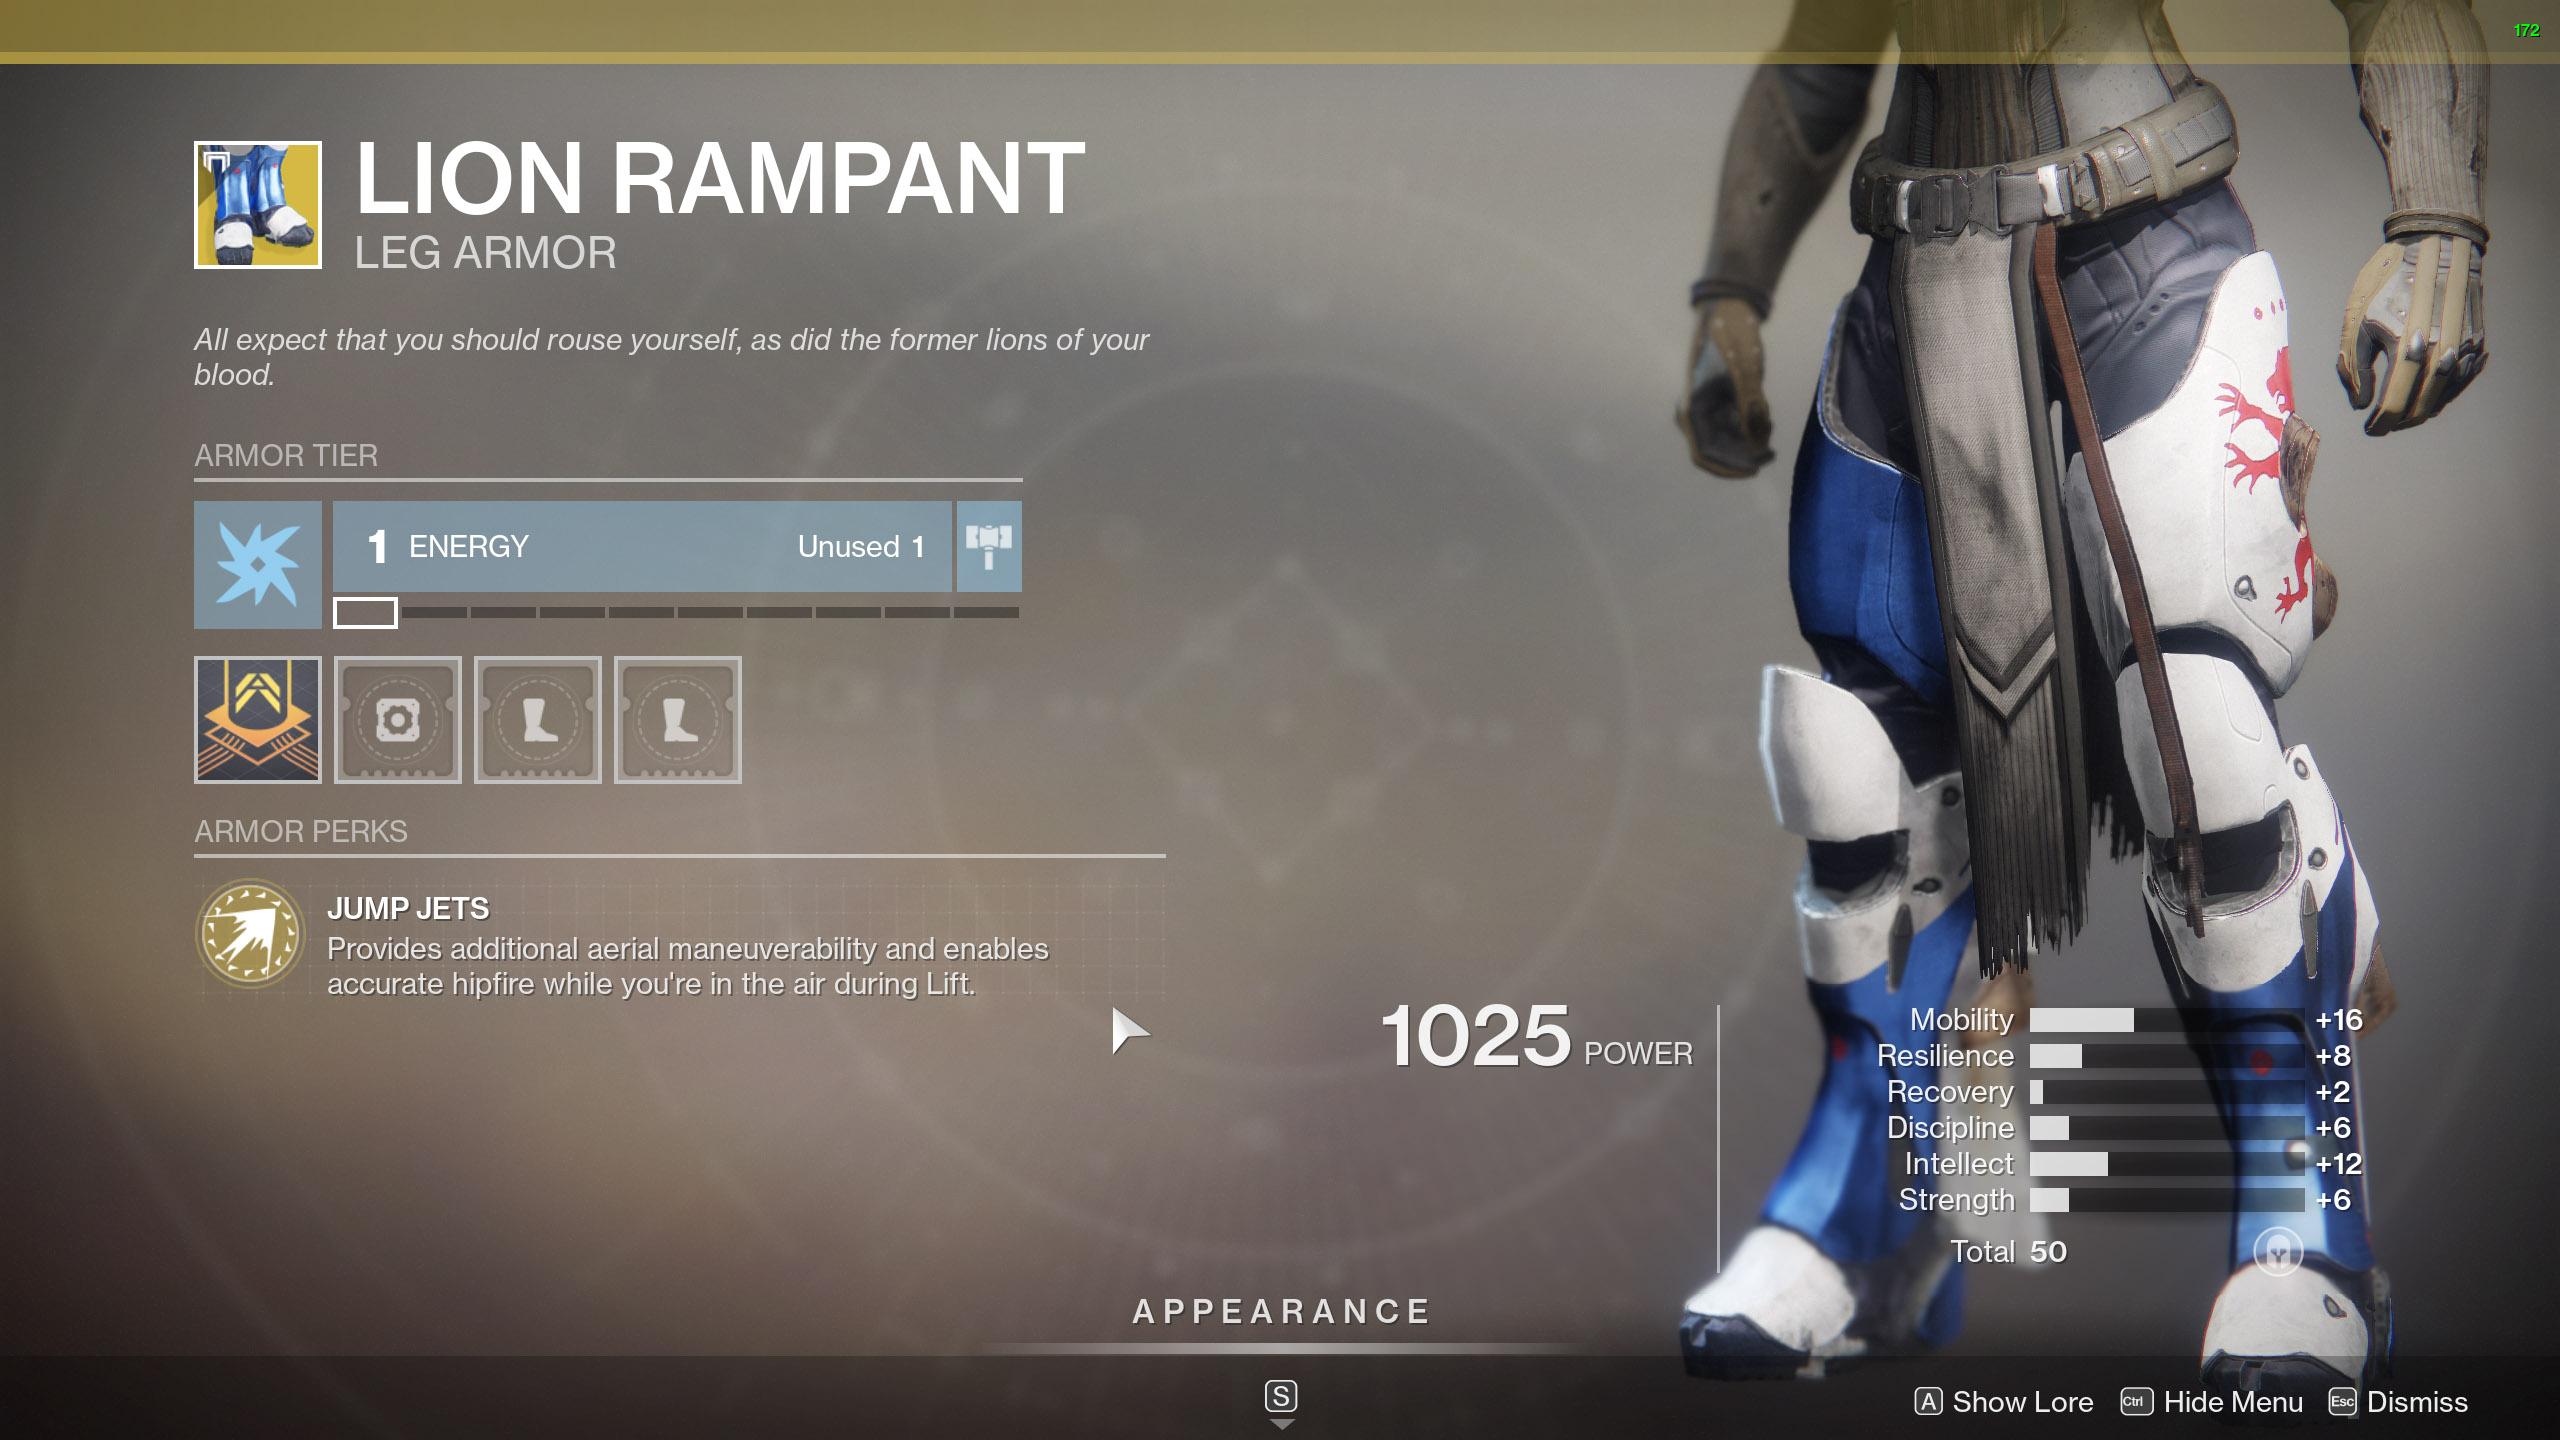 Destiny 2 Exotic Titan Armor Lion Rampant